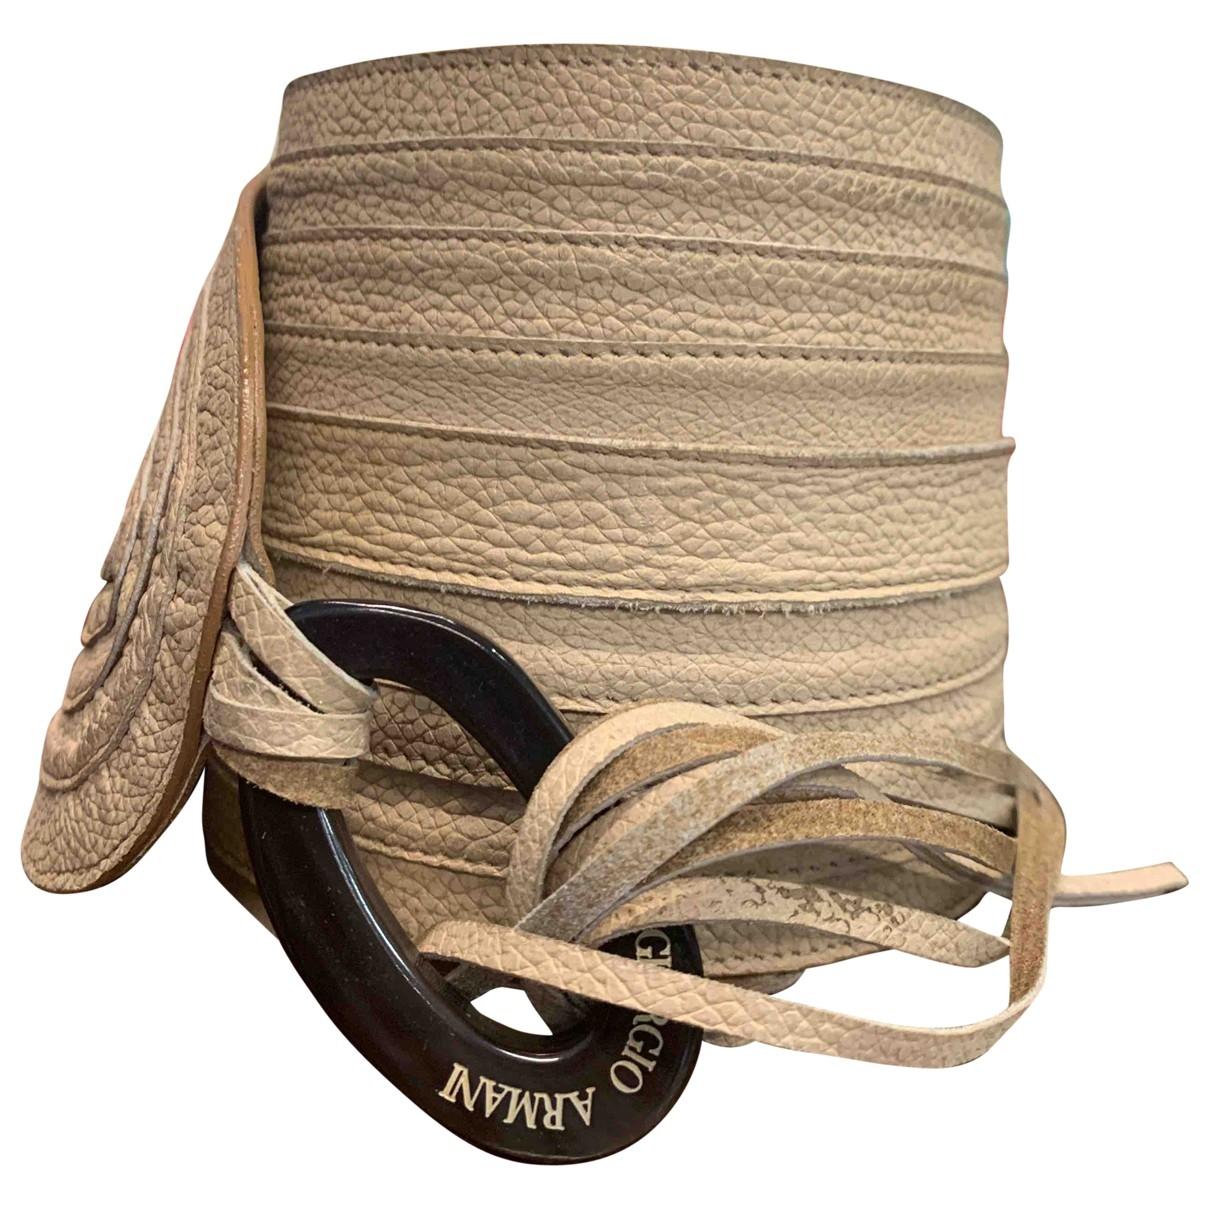 Giorgio Armani \N Beige Leather belt for Women S International